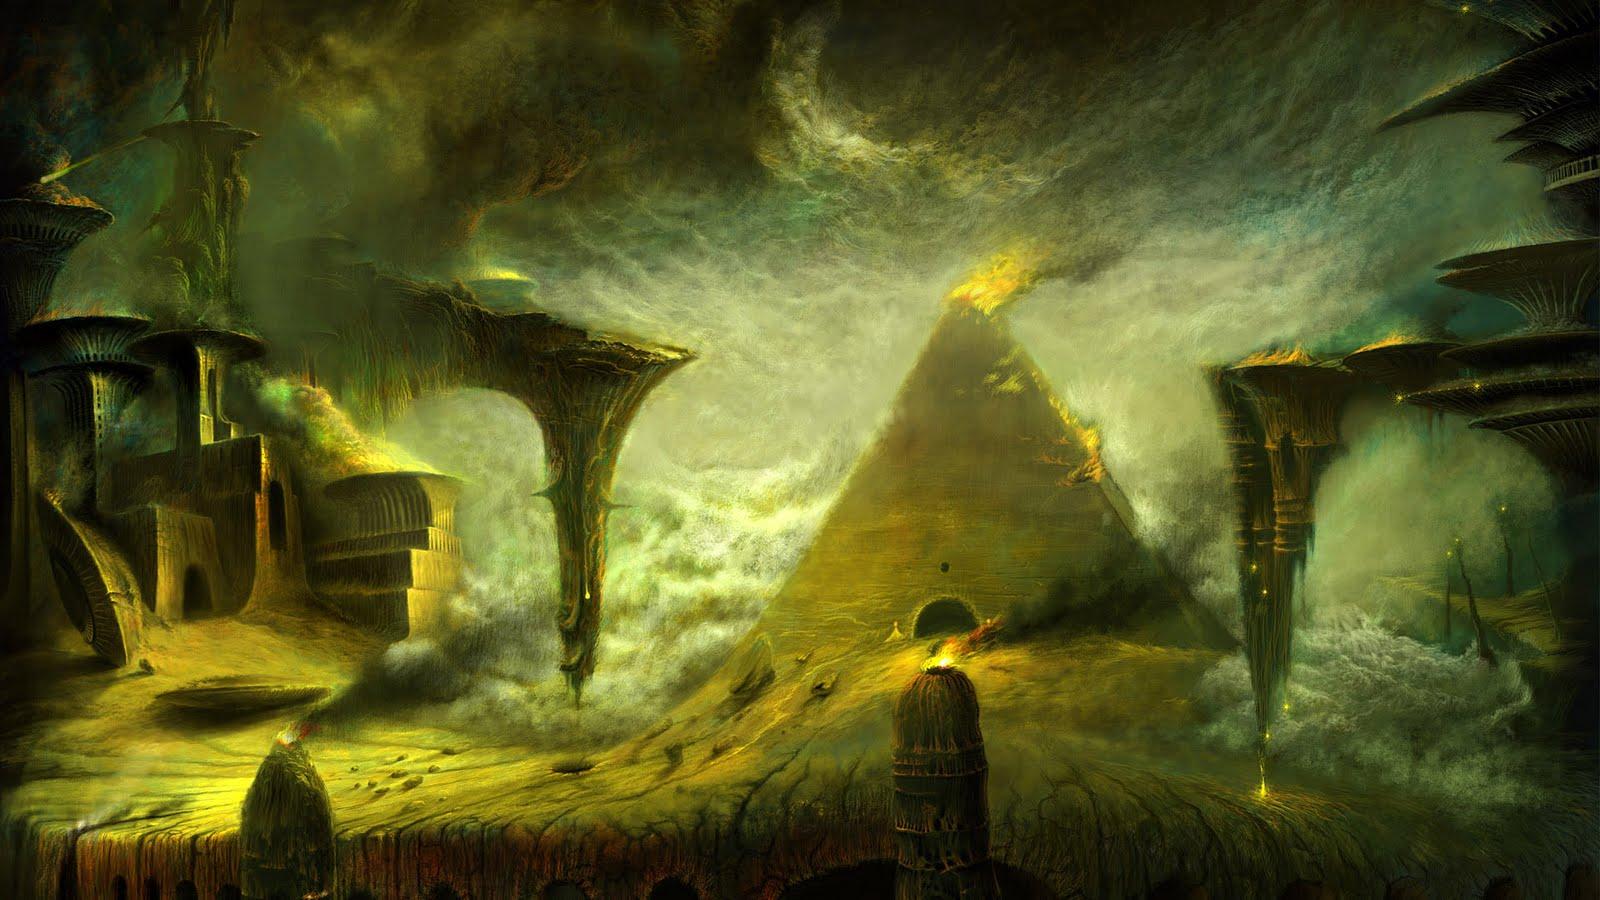 http://3.bp.blogspot.com/-M91VjGyr9bU/TkEXsABnUEI/AAAAAAAAD_8/K887KG4t6mw/s1600/HD_Wallpaper_Art_Downloads.jpg